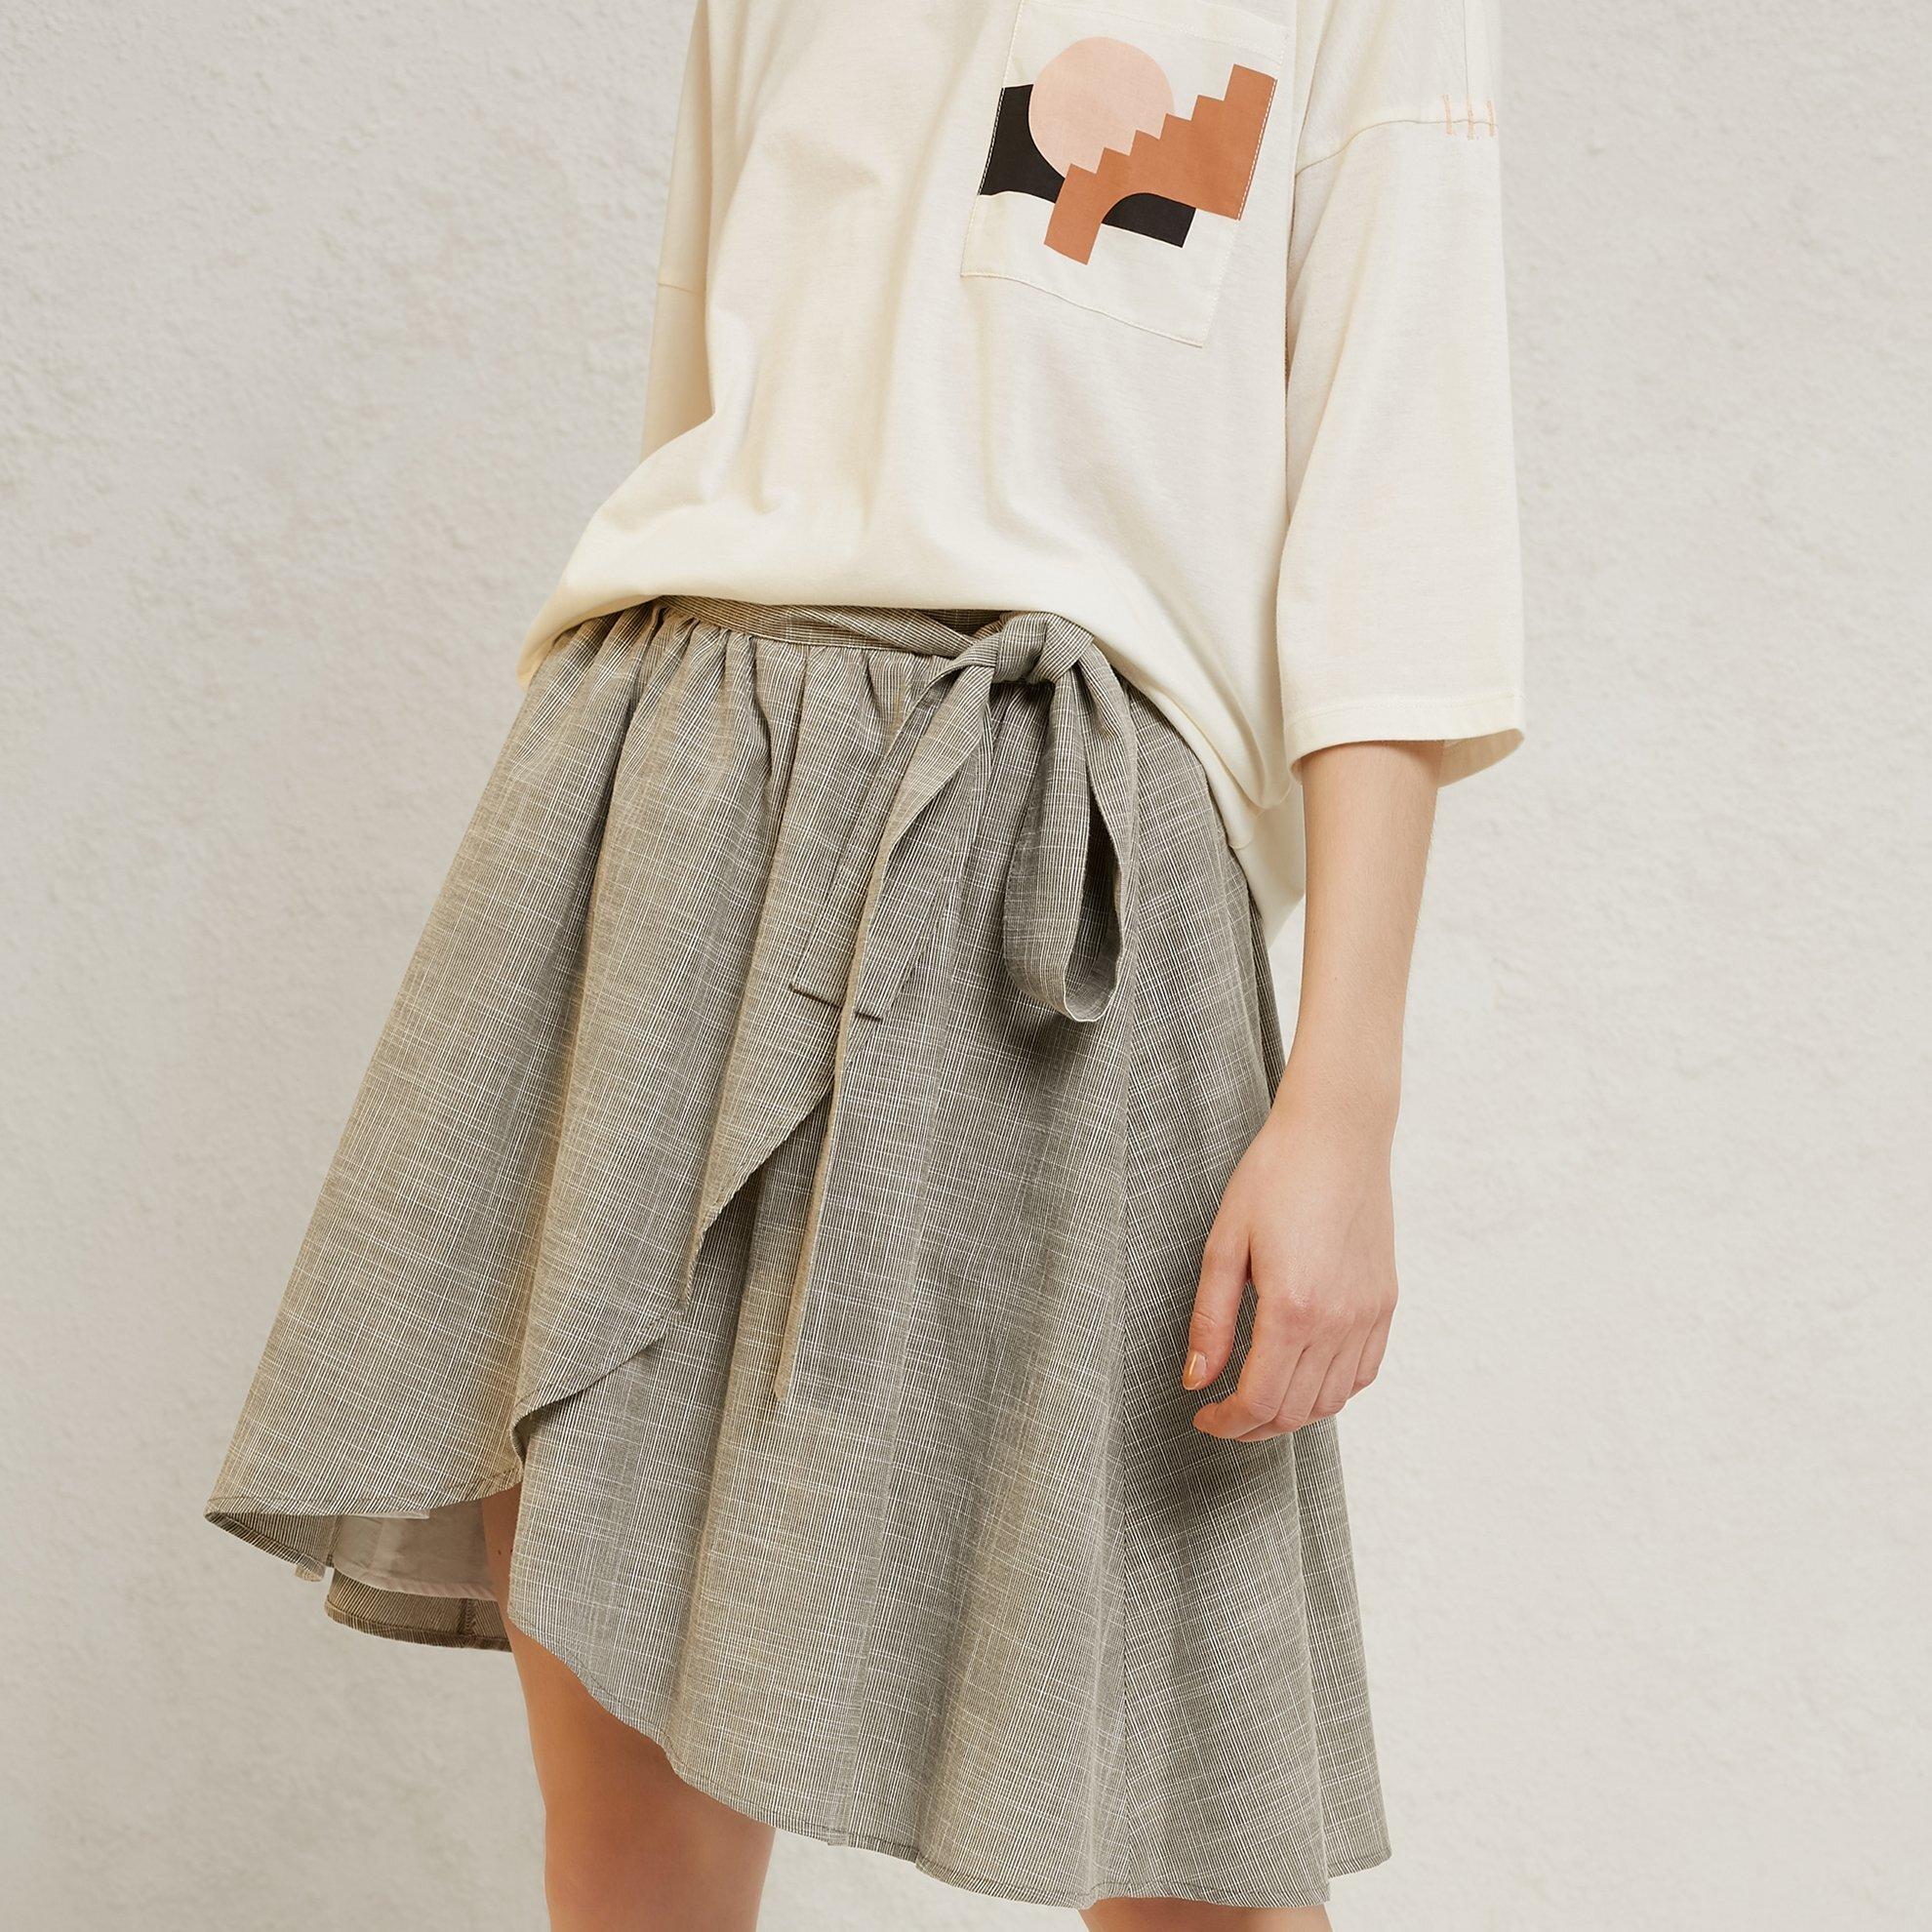 Tie Detail Skirt